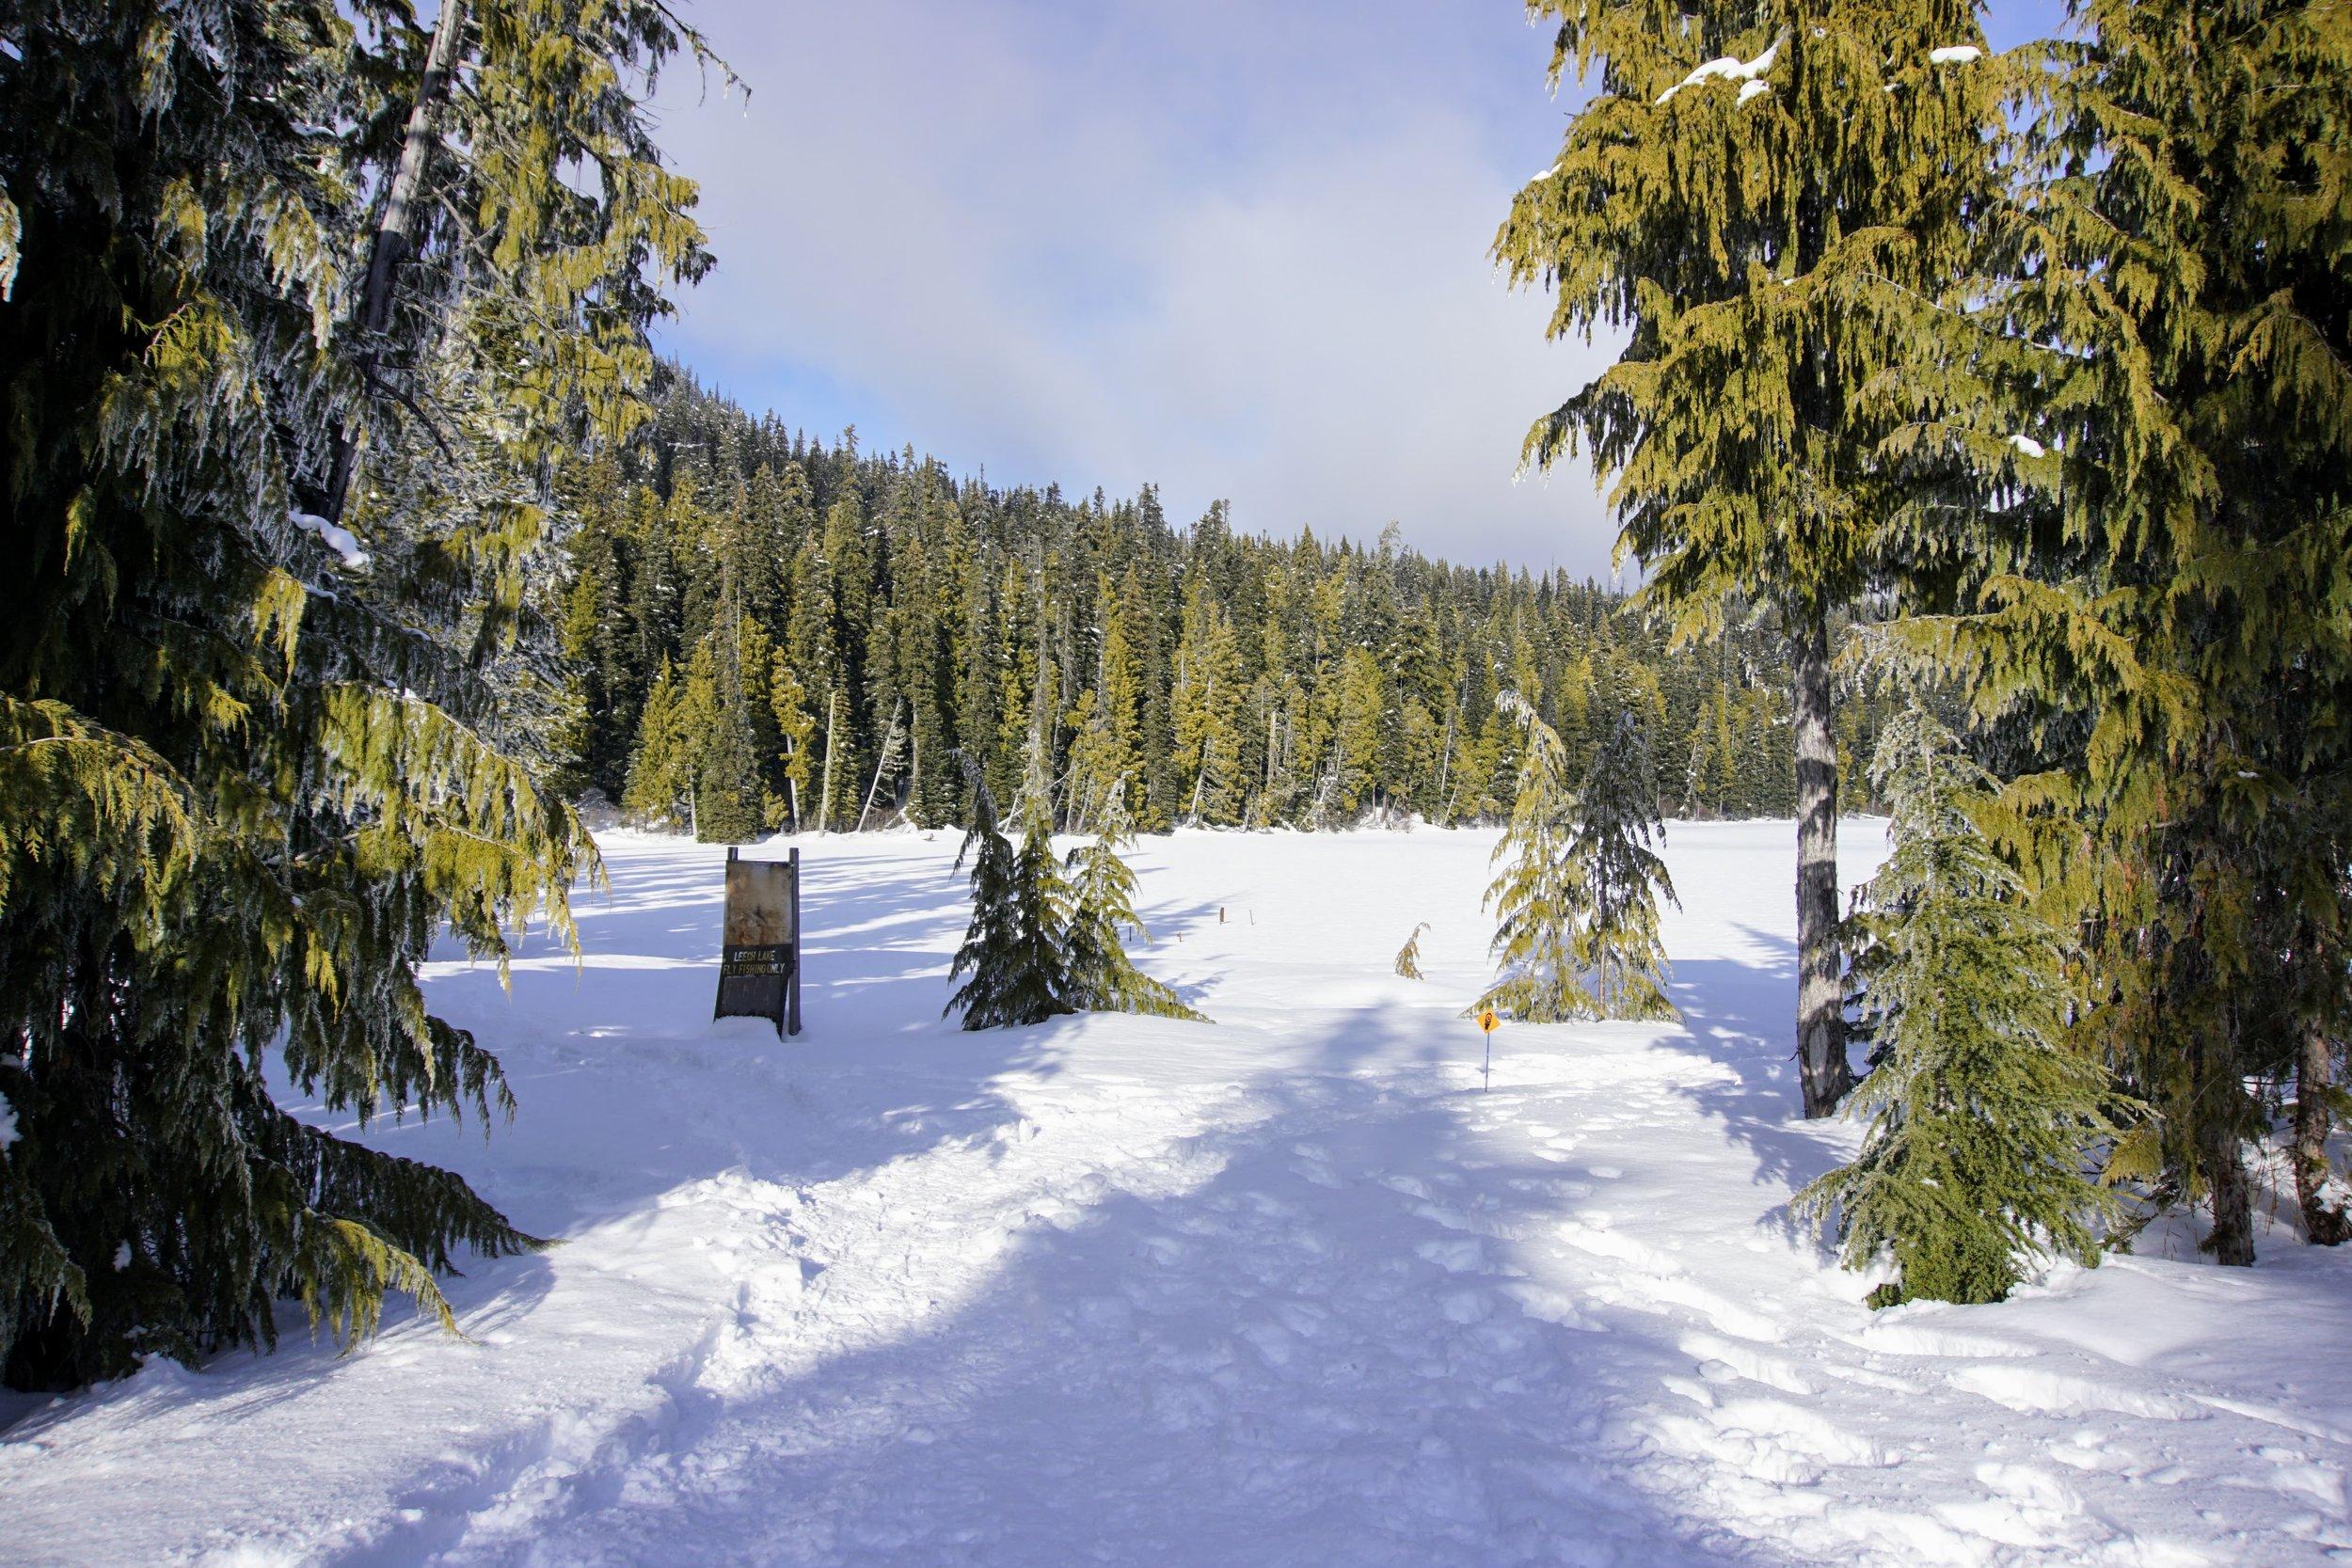 Snowshoeing trailhead